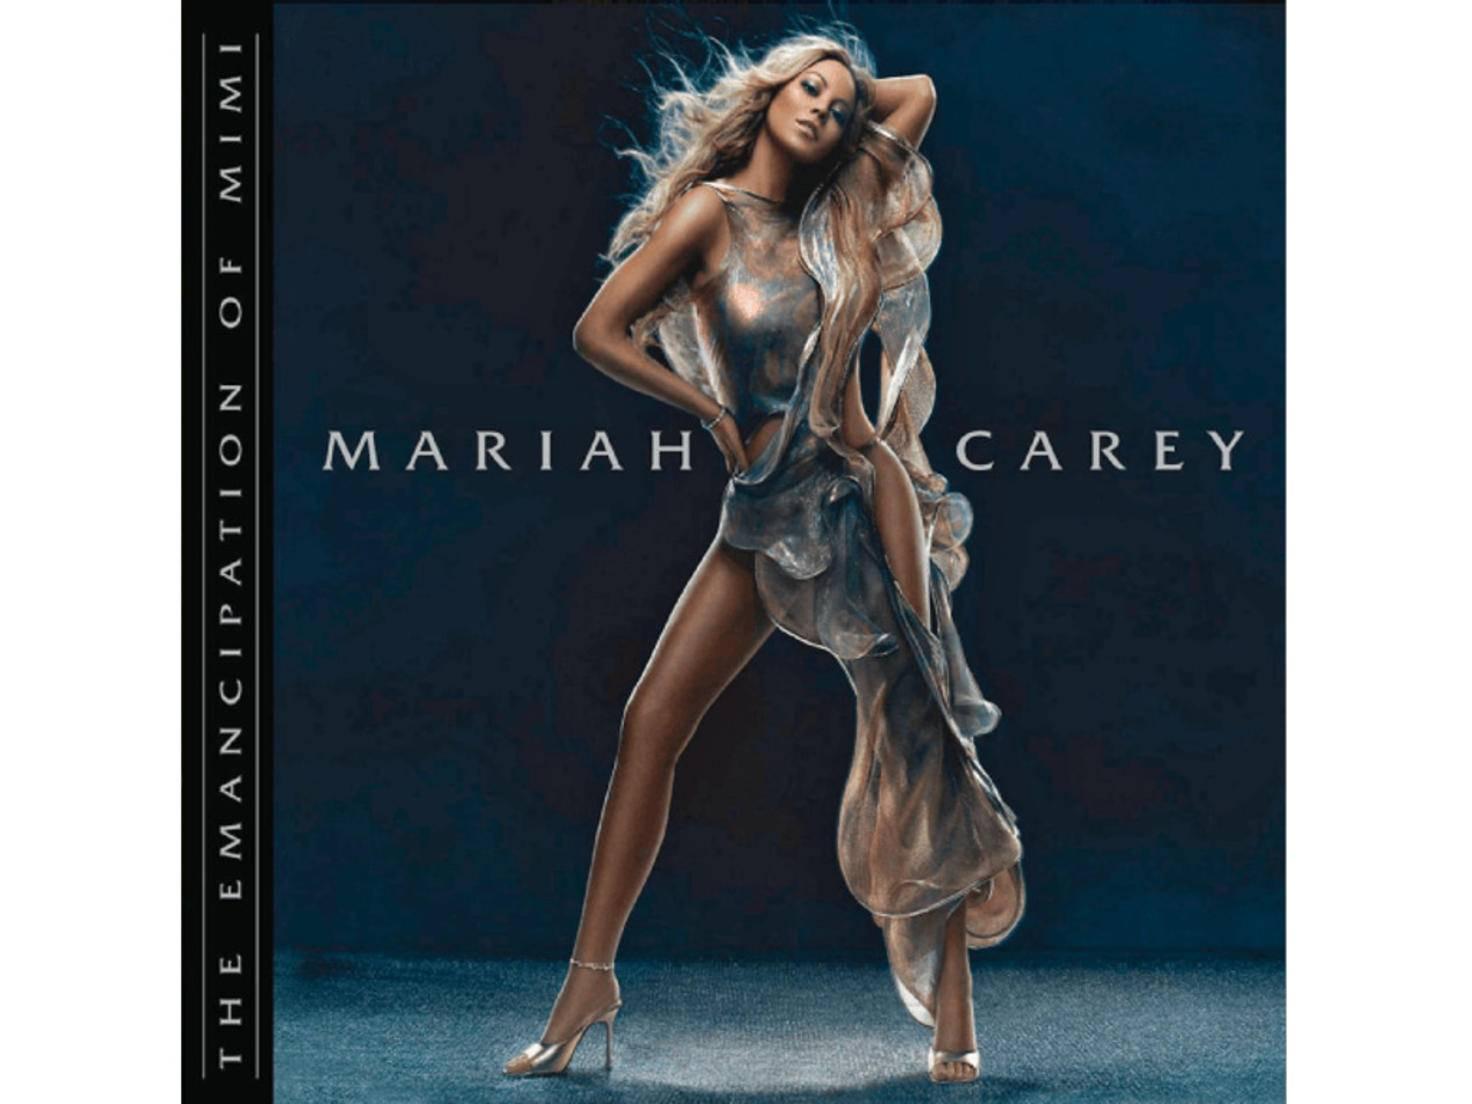 Mariah Carey The Imancipation of Mimi.jpg